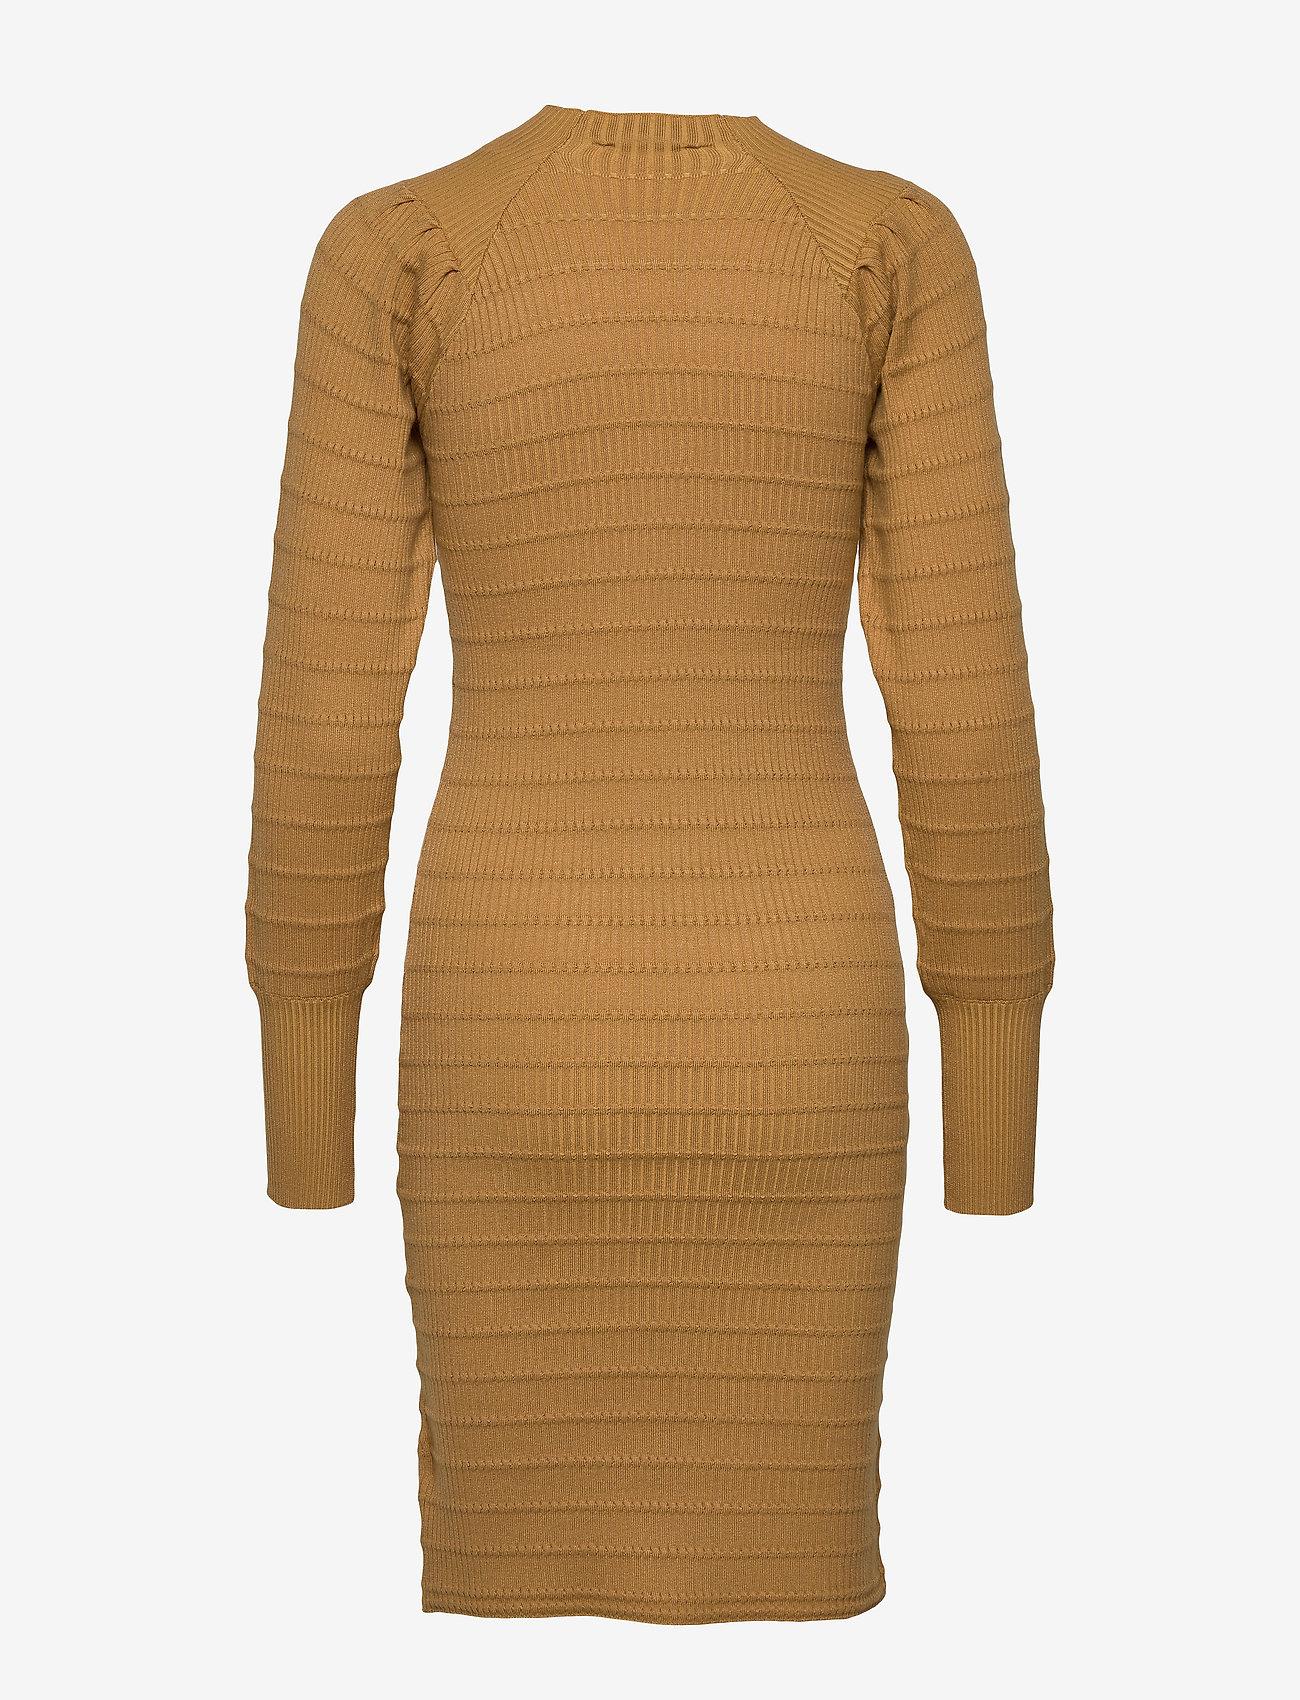 Soft Rebels Elenor Dress Knit - Dresses